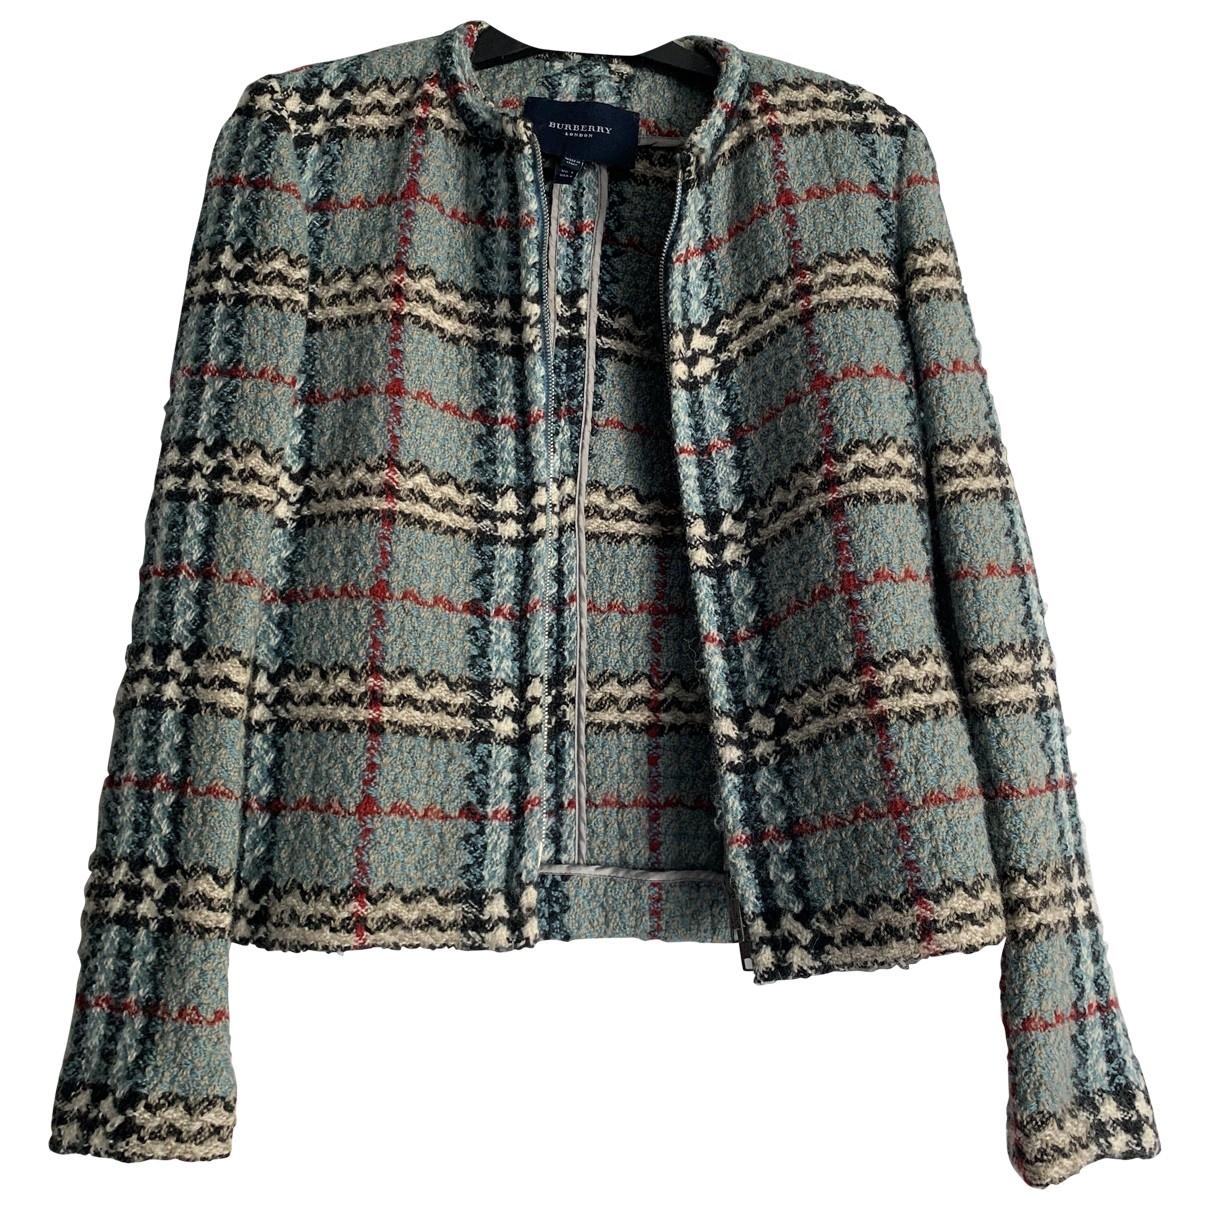 Burberry \N Green Wool jacket for Women 36 FR